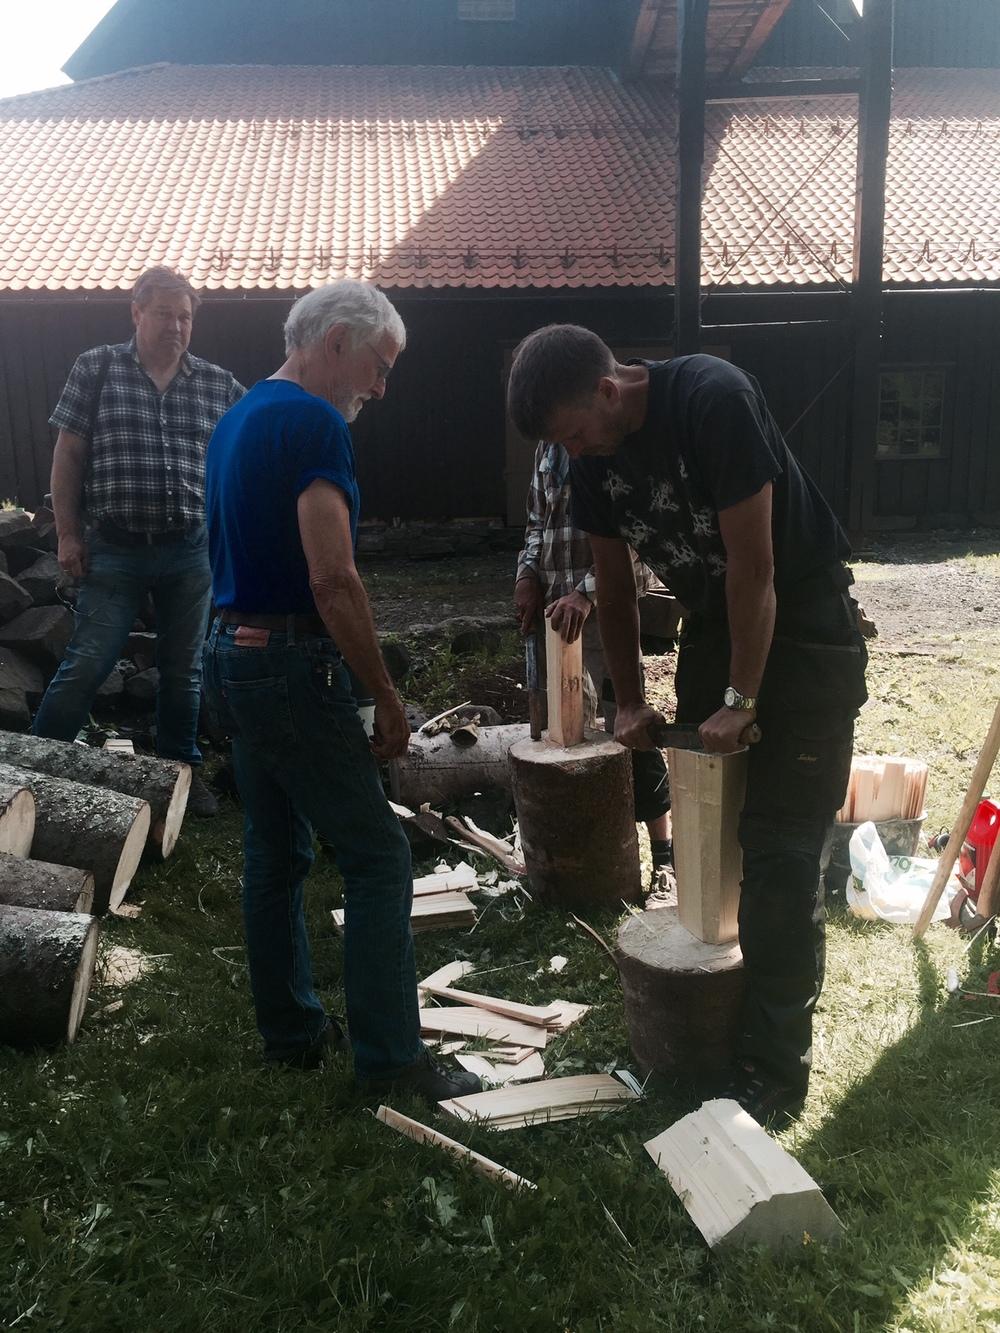 Lars N. Løvdal fra Sollie Bygg viser besøkende under Smed- og Håndverksmessen på Næs Jernverk hvordan en håndkløyver takspon.